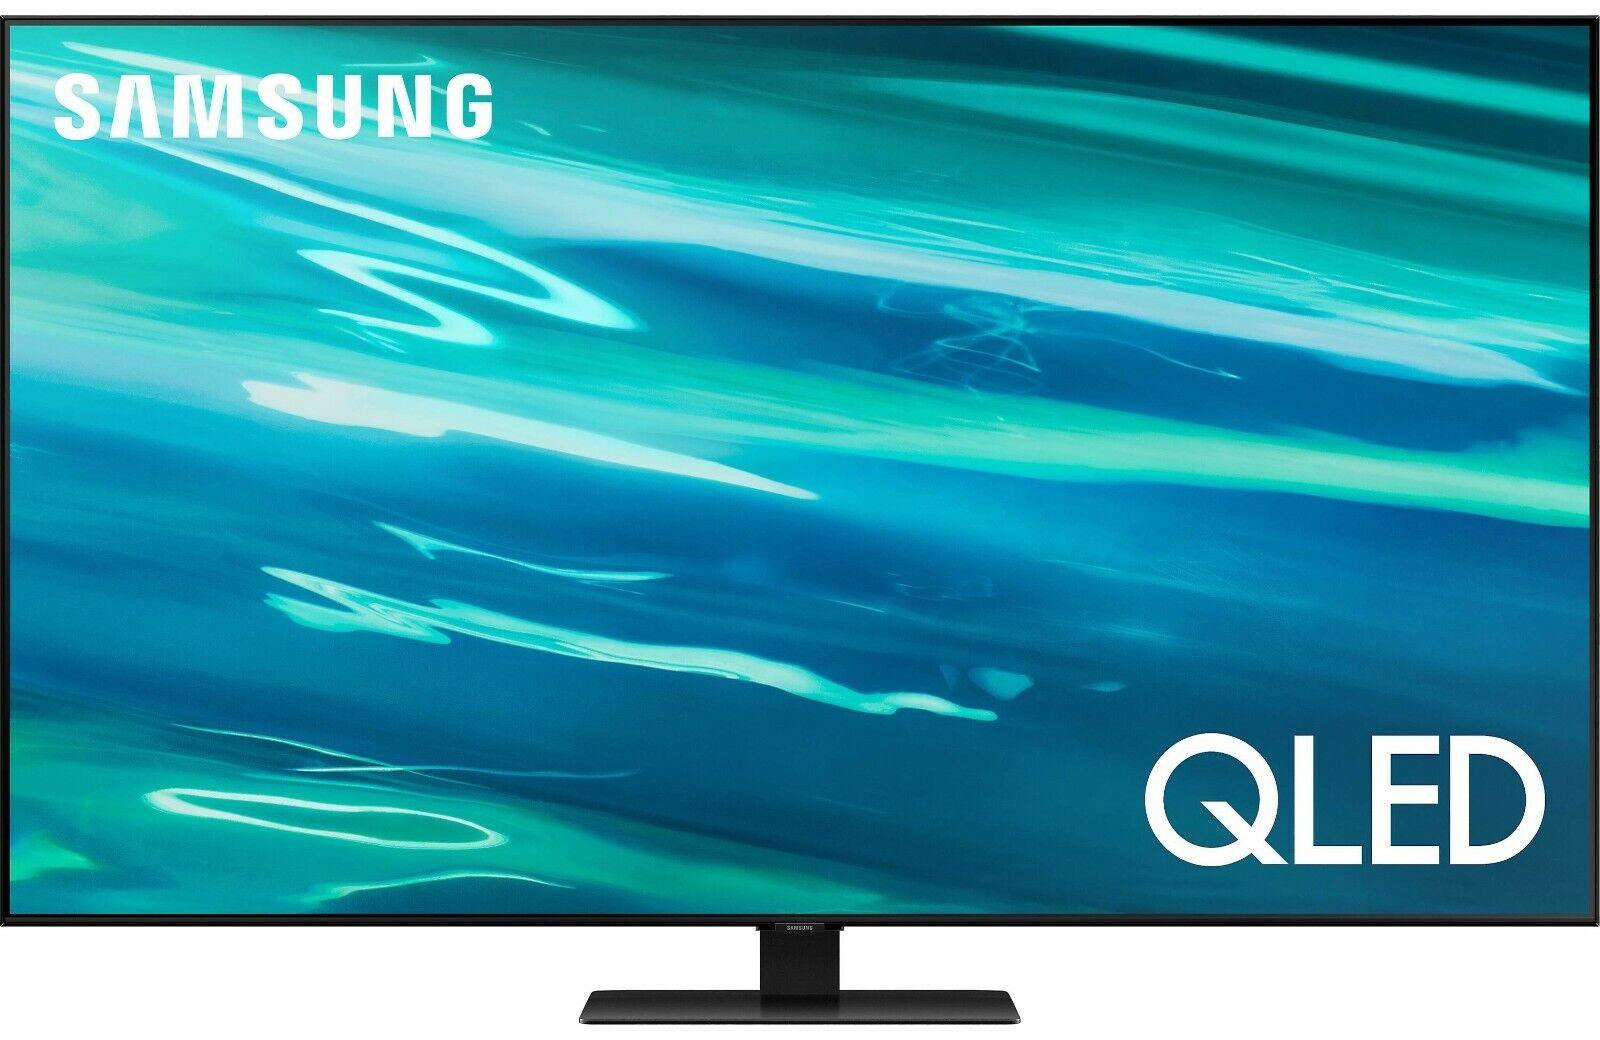 Samsung QN55Q80AAFXZA 55 4K Smart QLED LED TV QN55Q80A 10 Bit 2021. Available Now for 1249.95